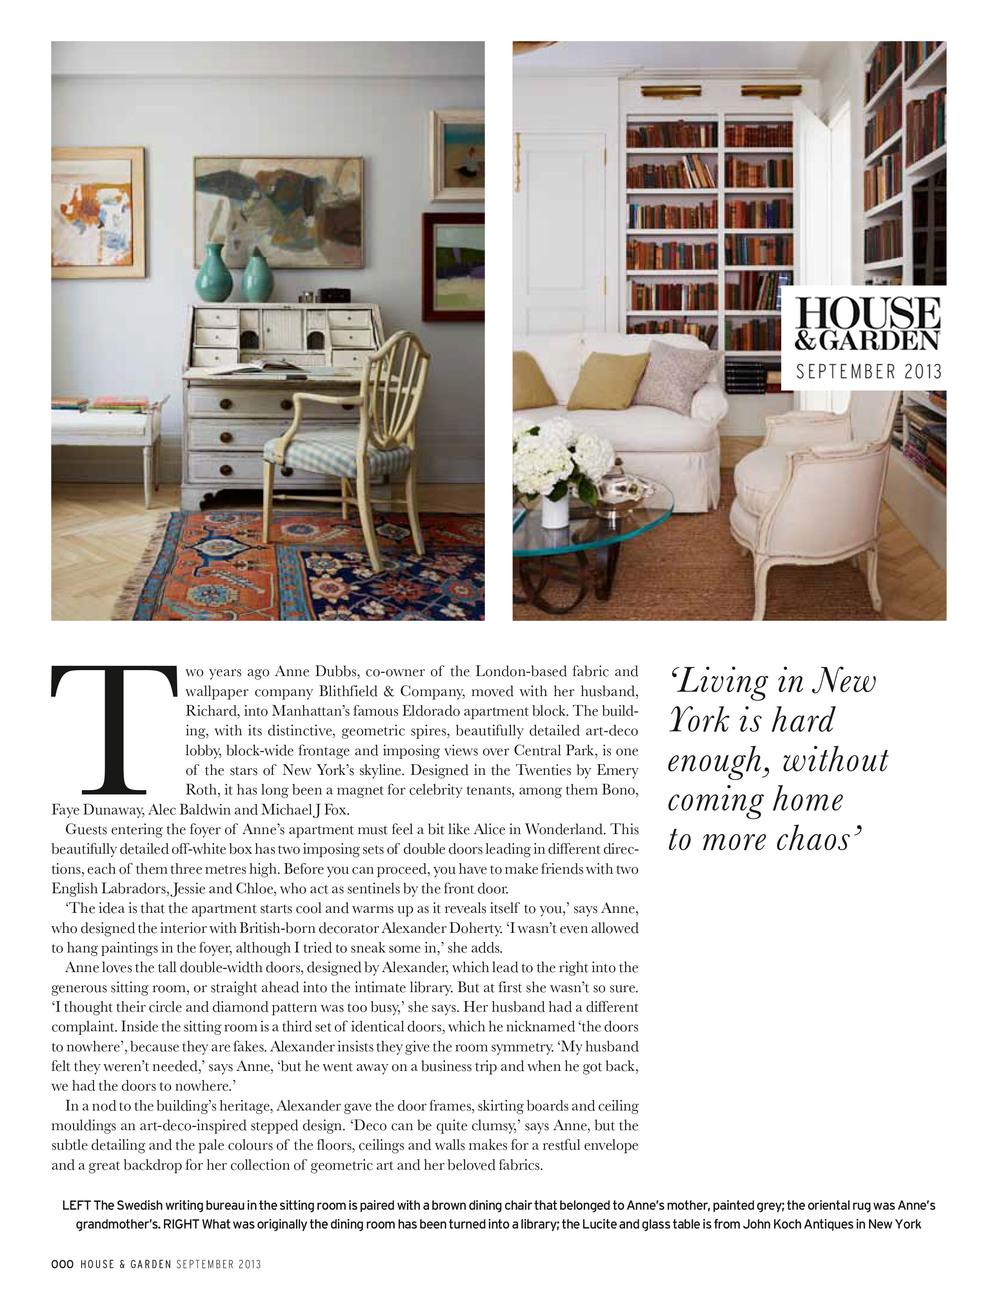 HOUSE AND GARDEN 3.jpg